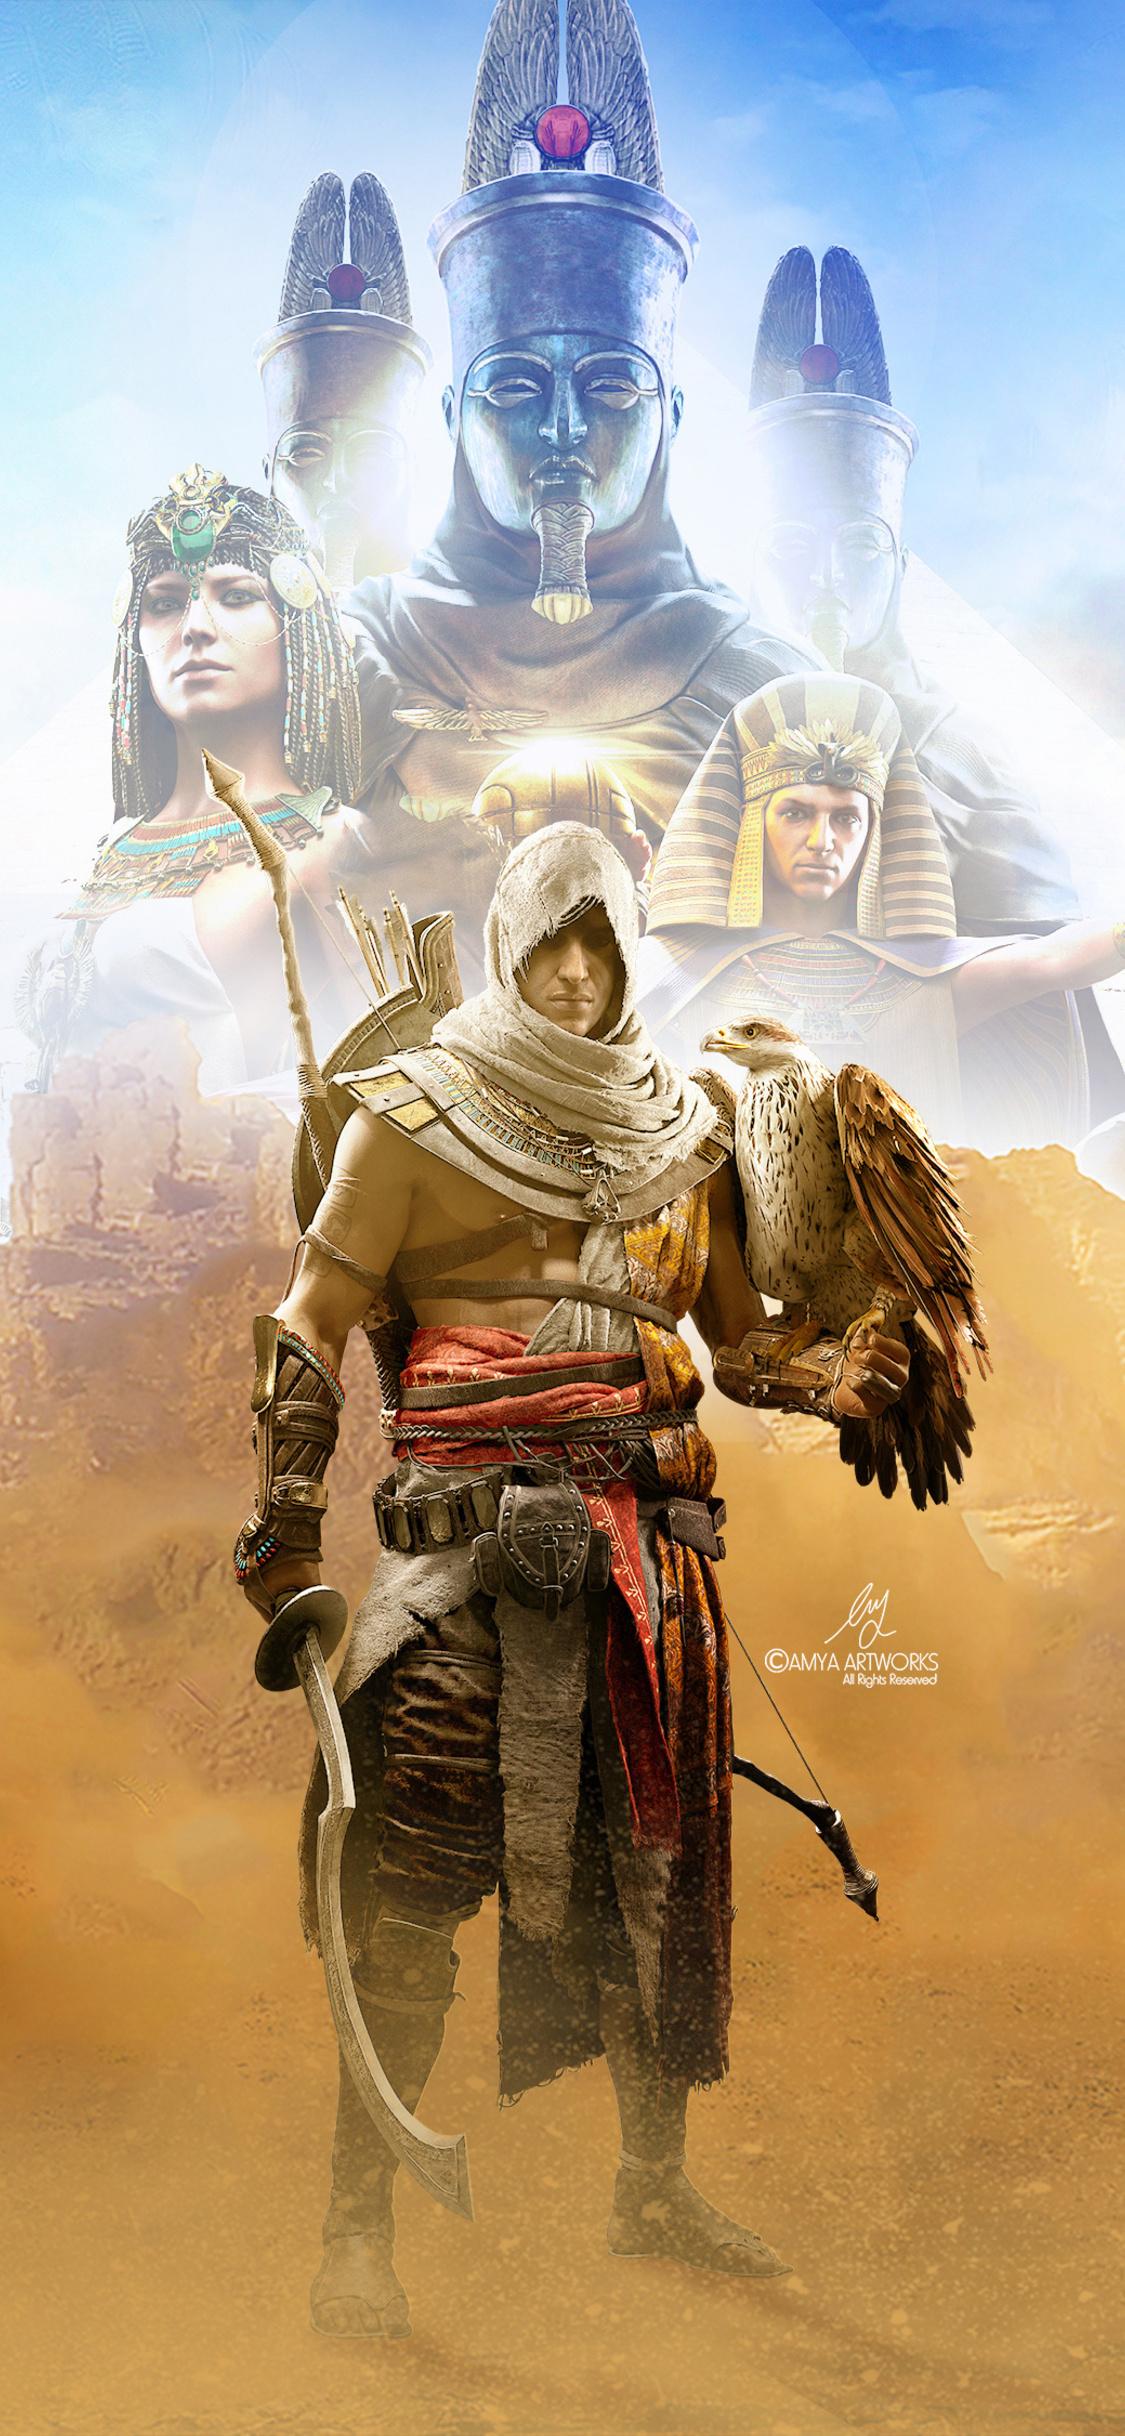 1125x2436 4k Assassins Creed Origins Iphone Xs Iphone 10 Iphone X Hd